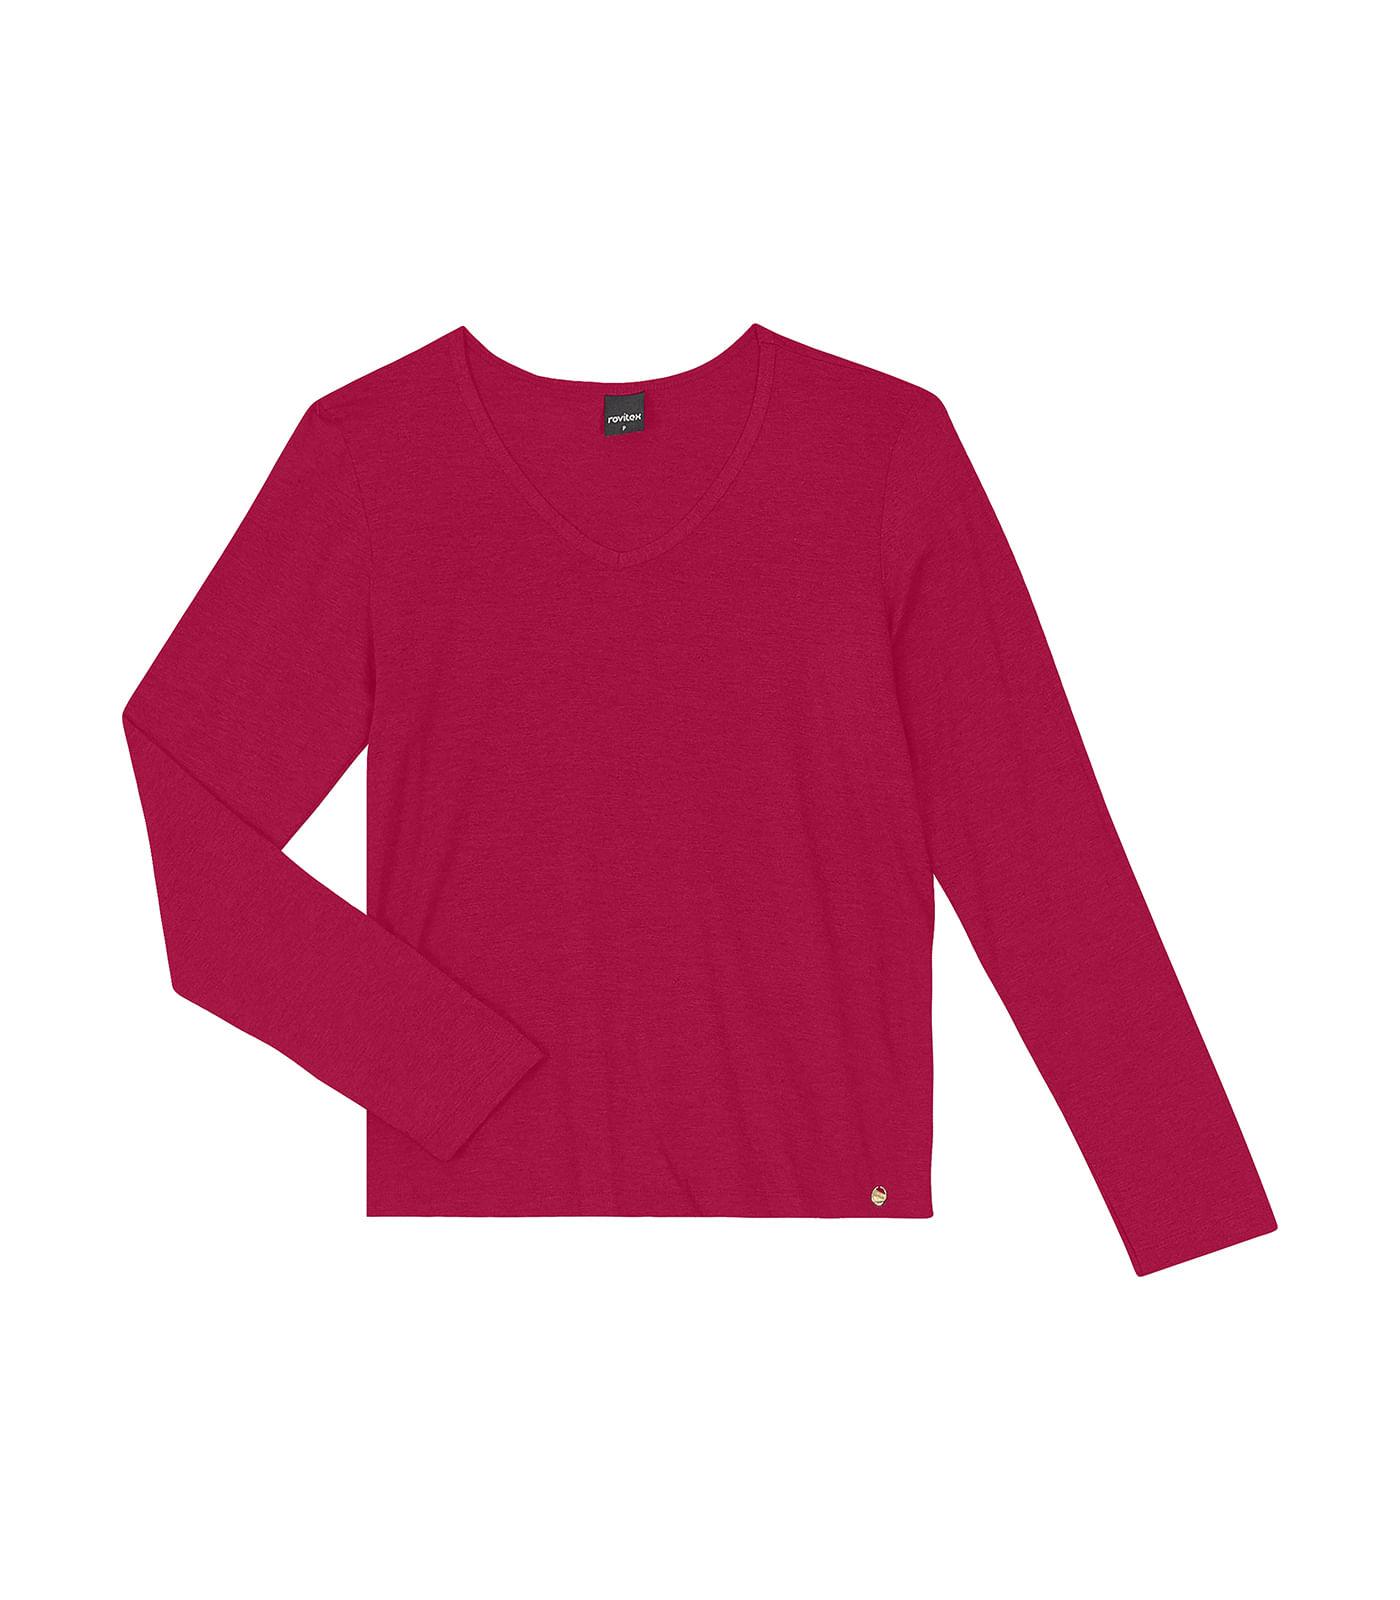 Blusa-Feminina-Manga-Longa-Rovitex-Vermelho